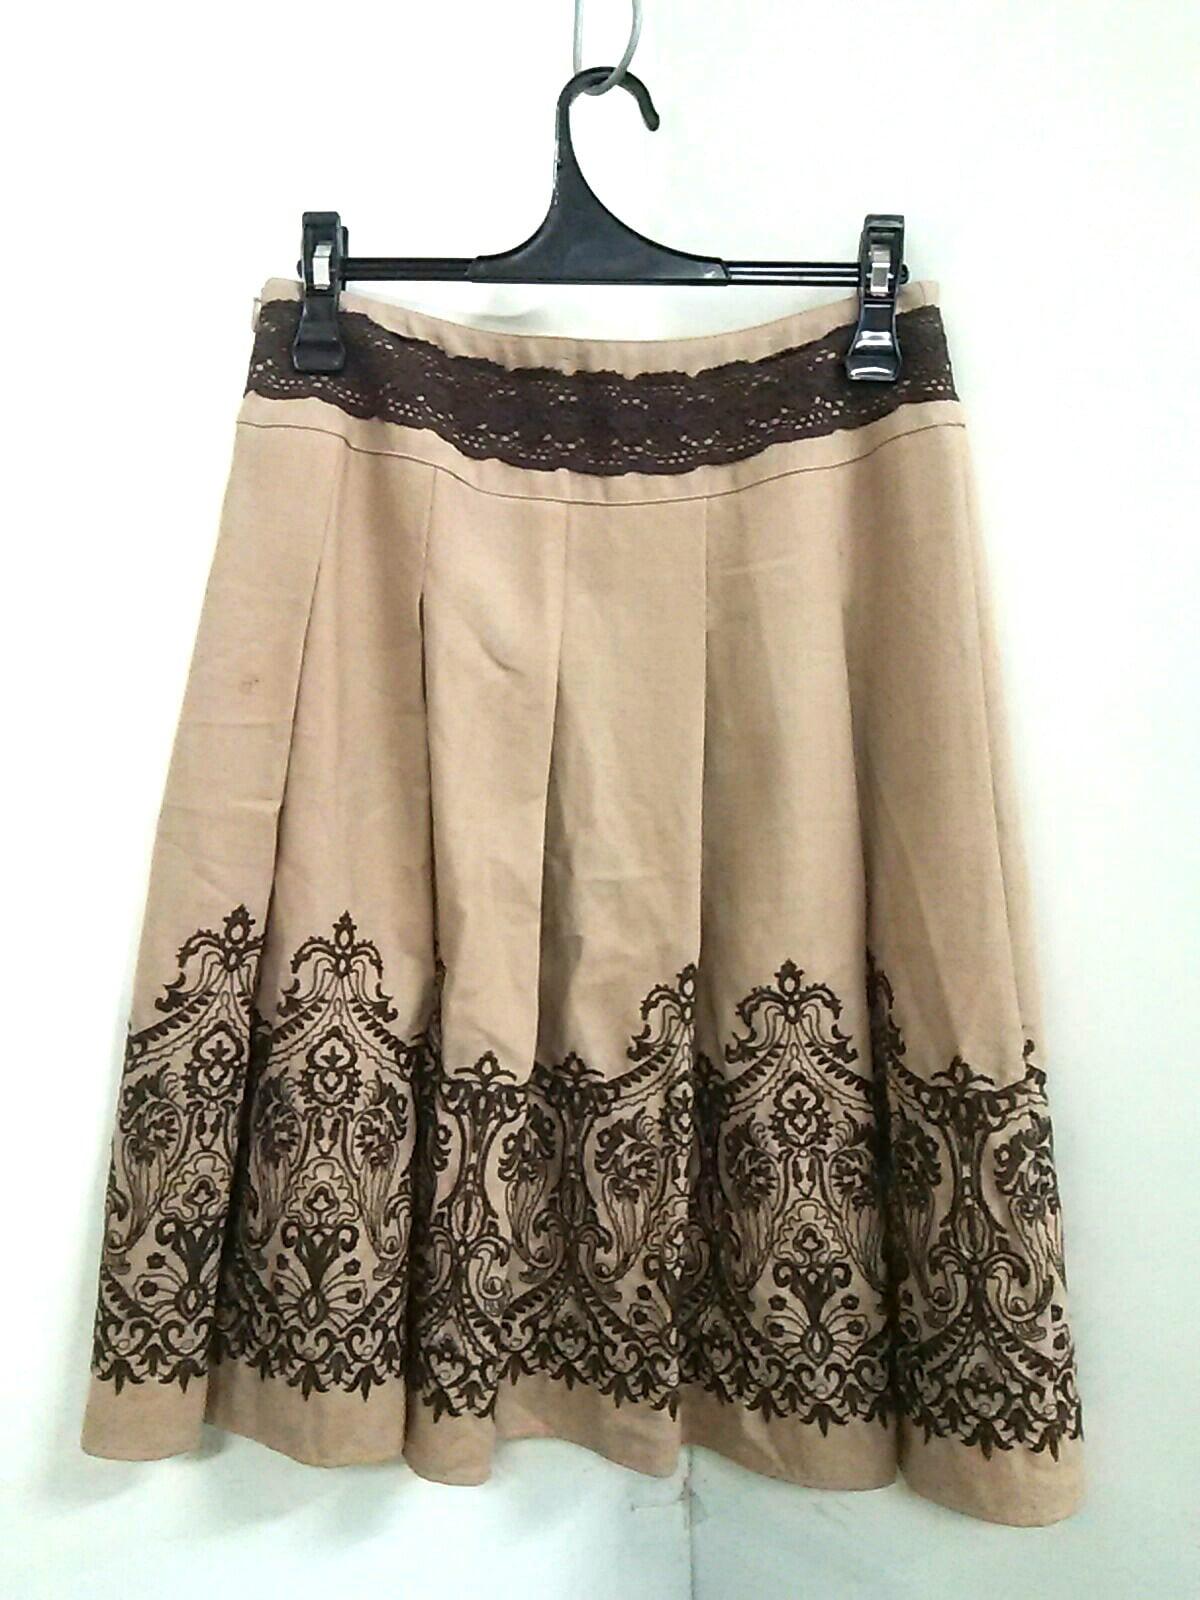 VIVA PRESTO(ヴィヴァプレスト)のスカート